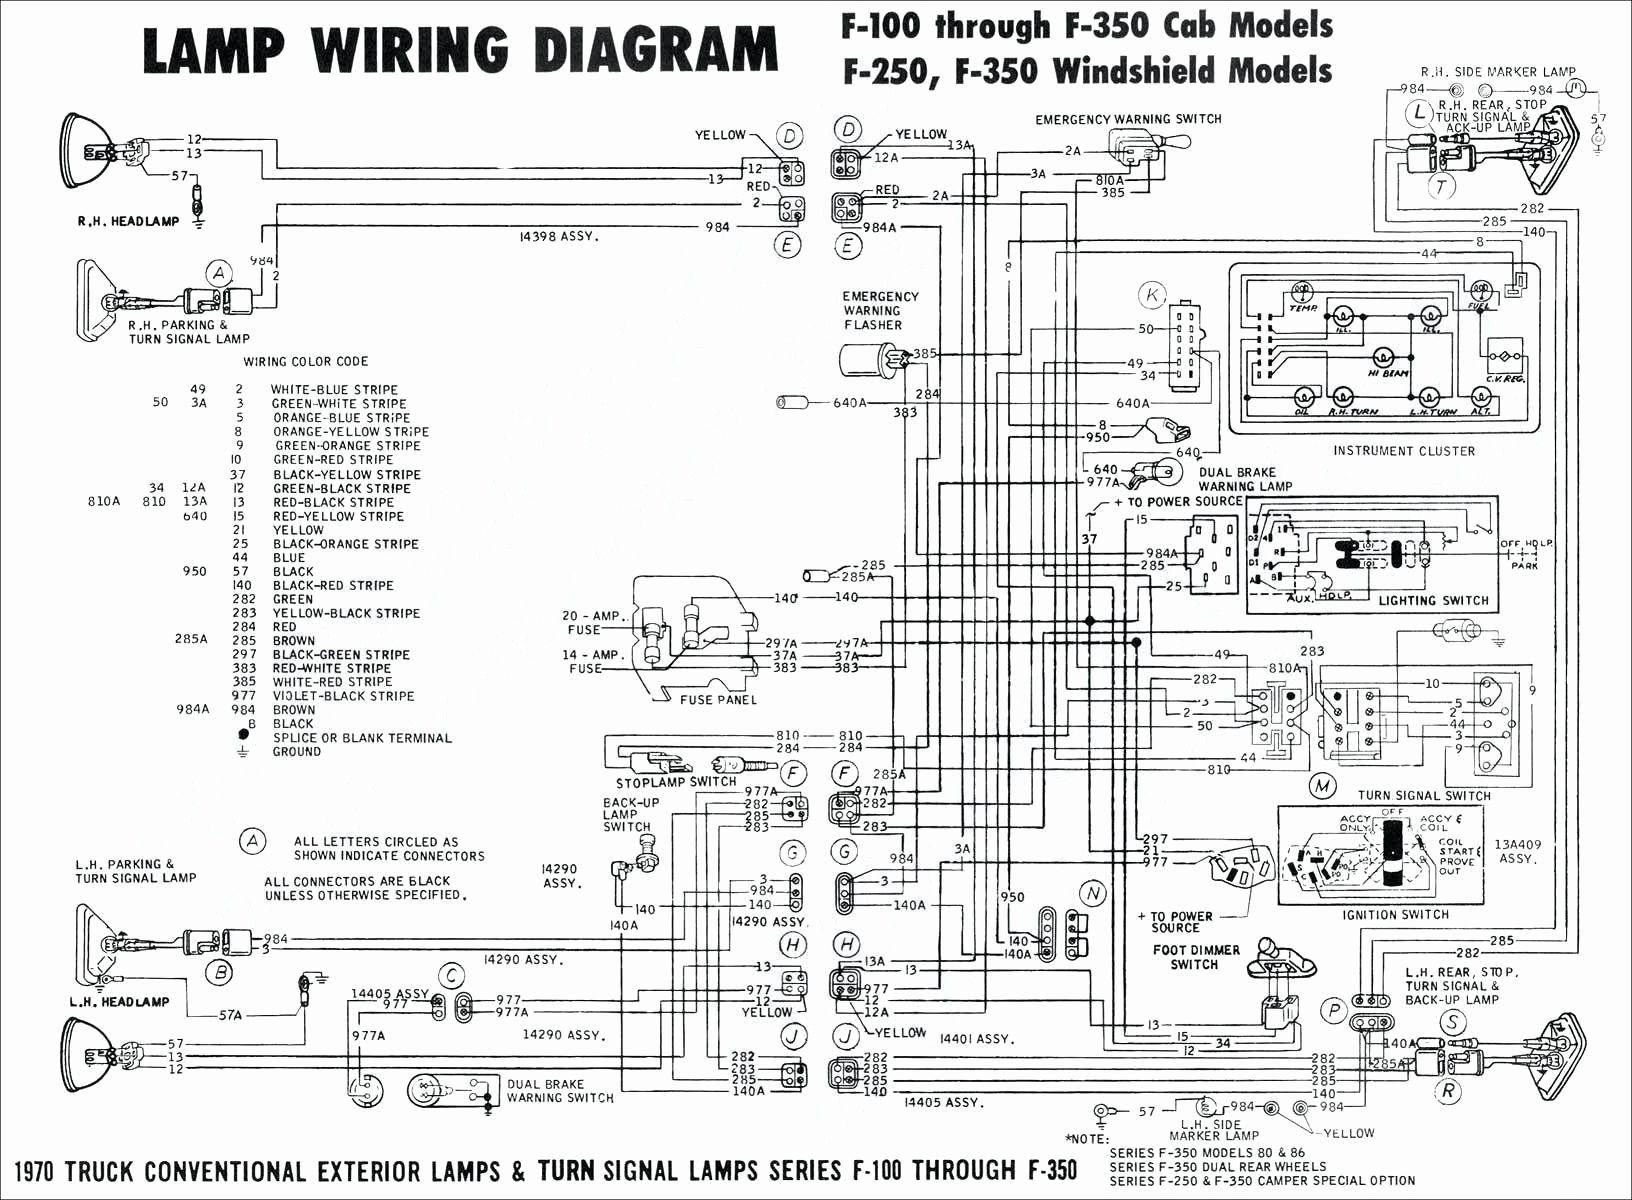 1999 Dodge Ram 2500 Headlight Wiring Diagram